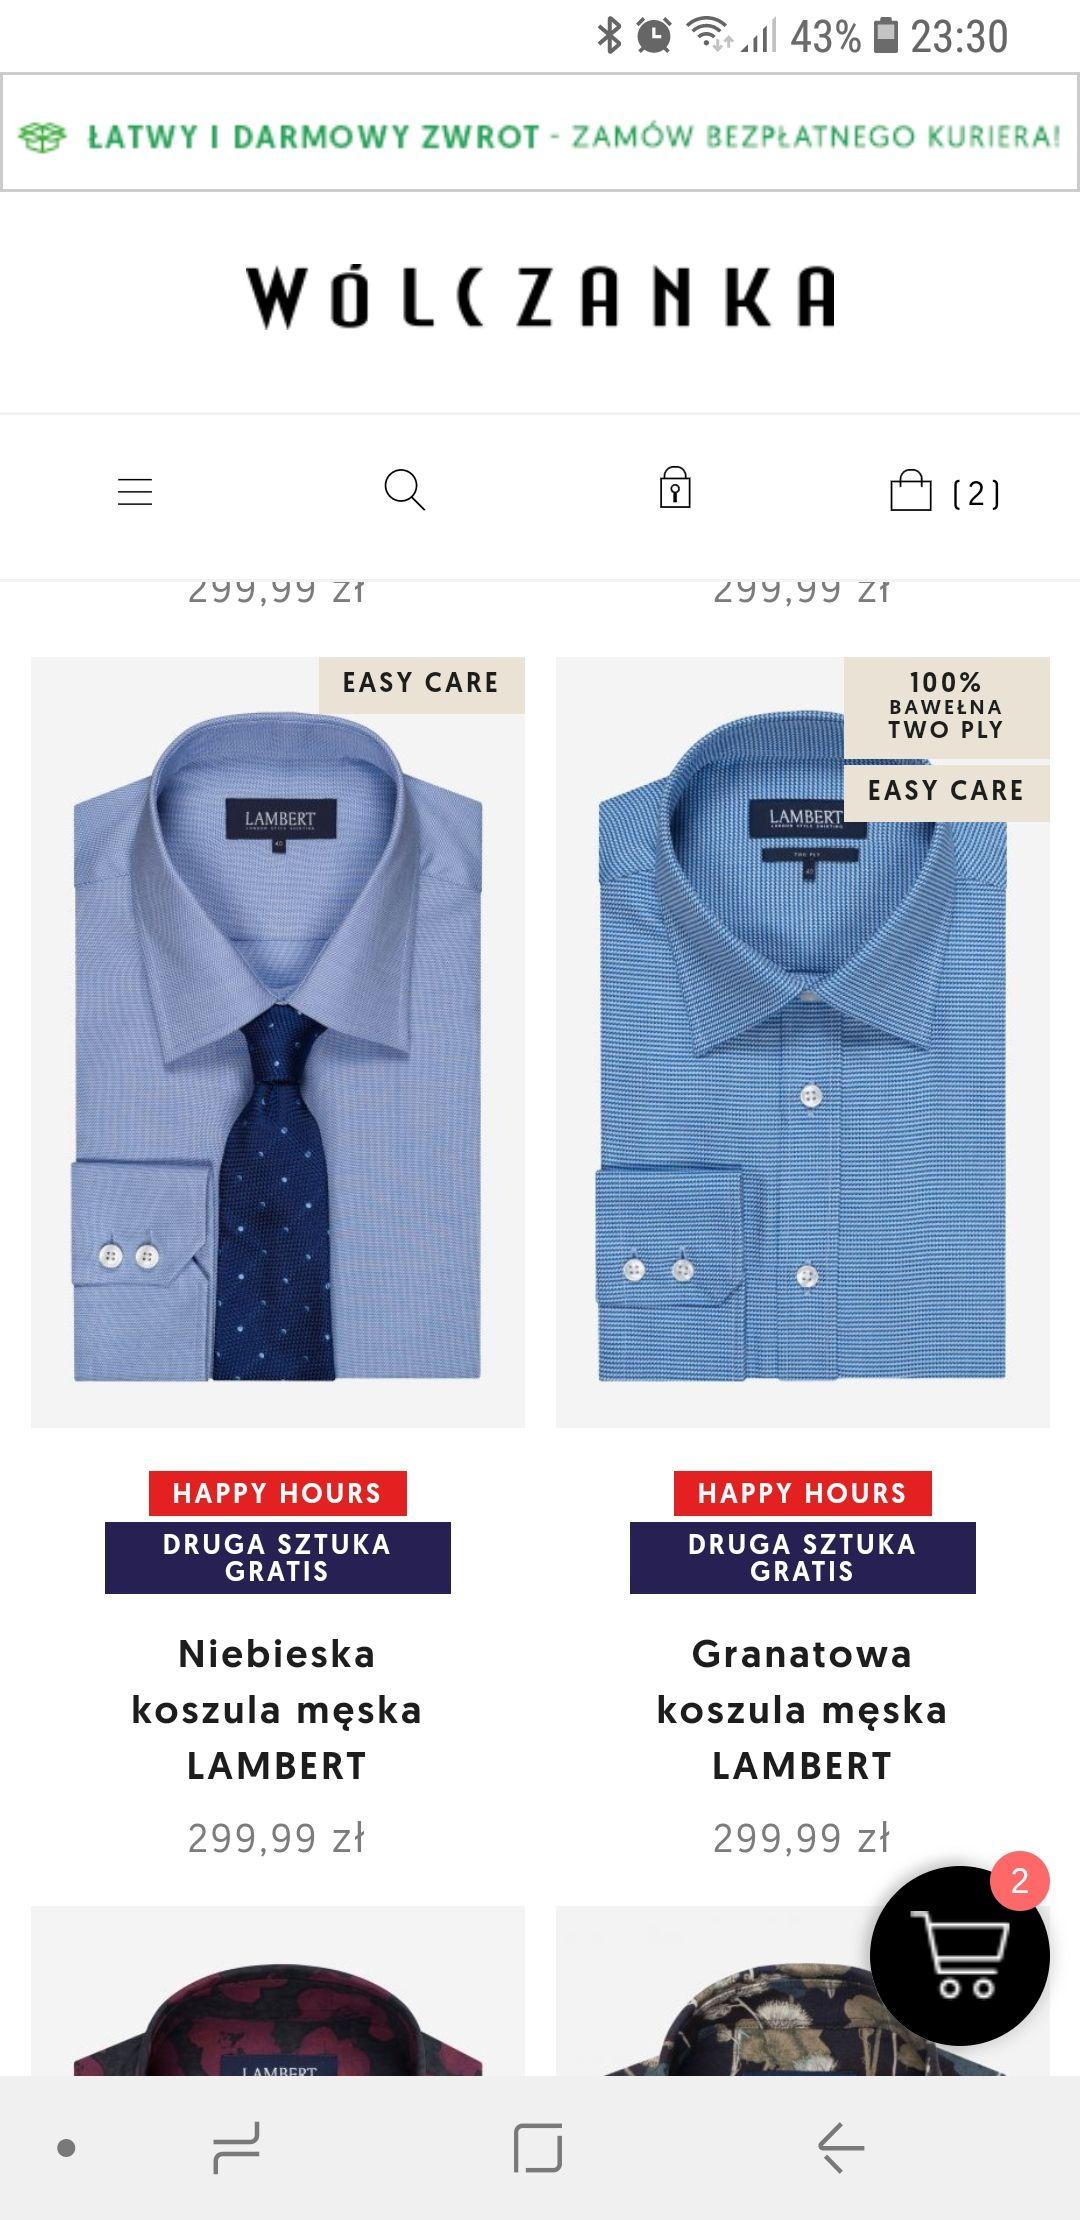 2x koszula LAMBERT za 150 PLN